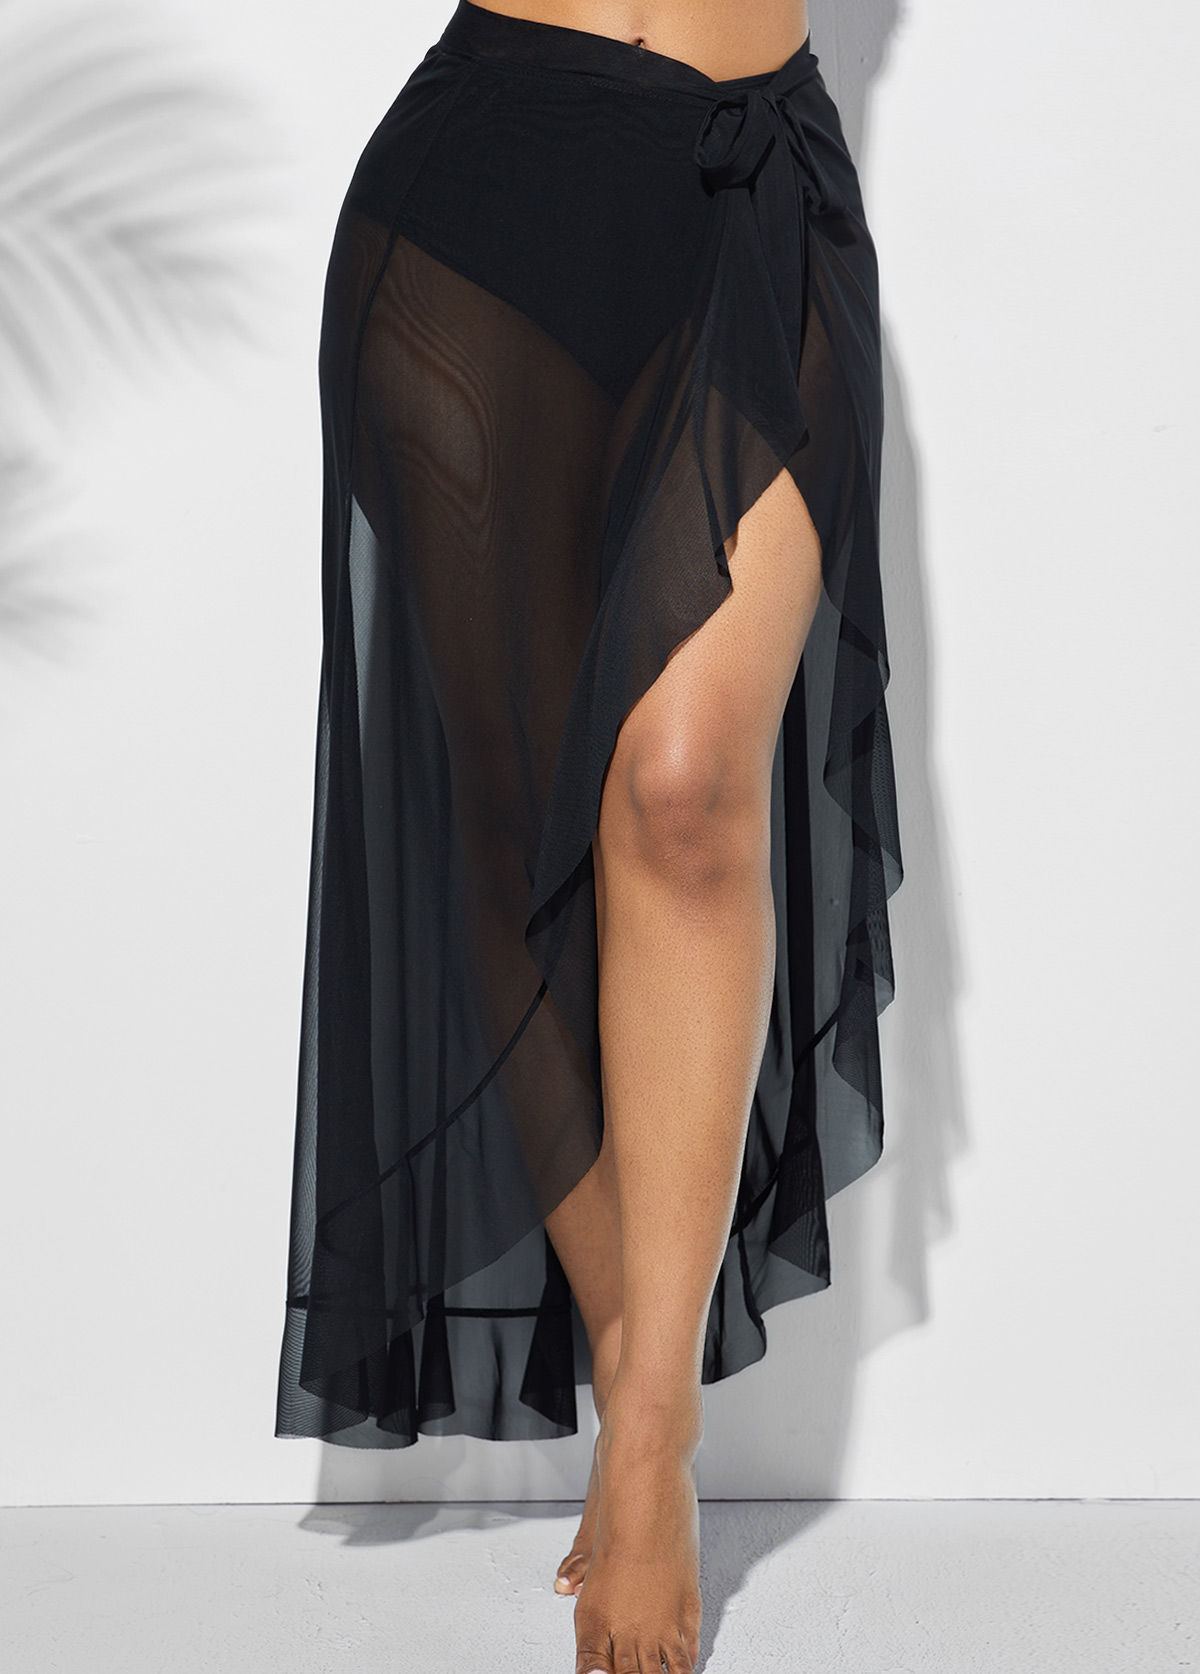 ROTITA Asymmetric Hem Side Slit One Piece Beach Skirt